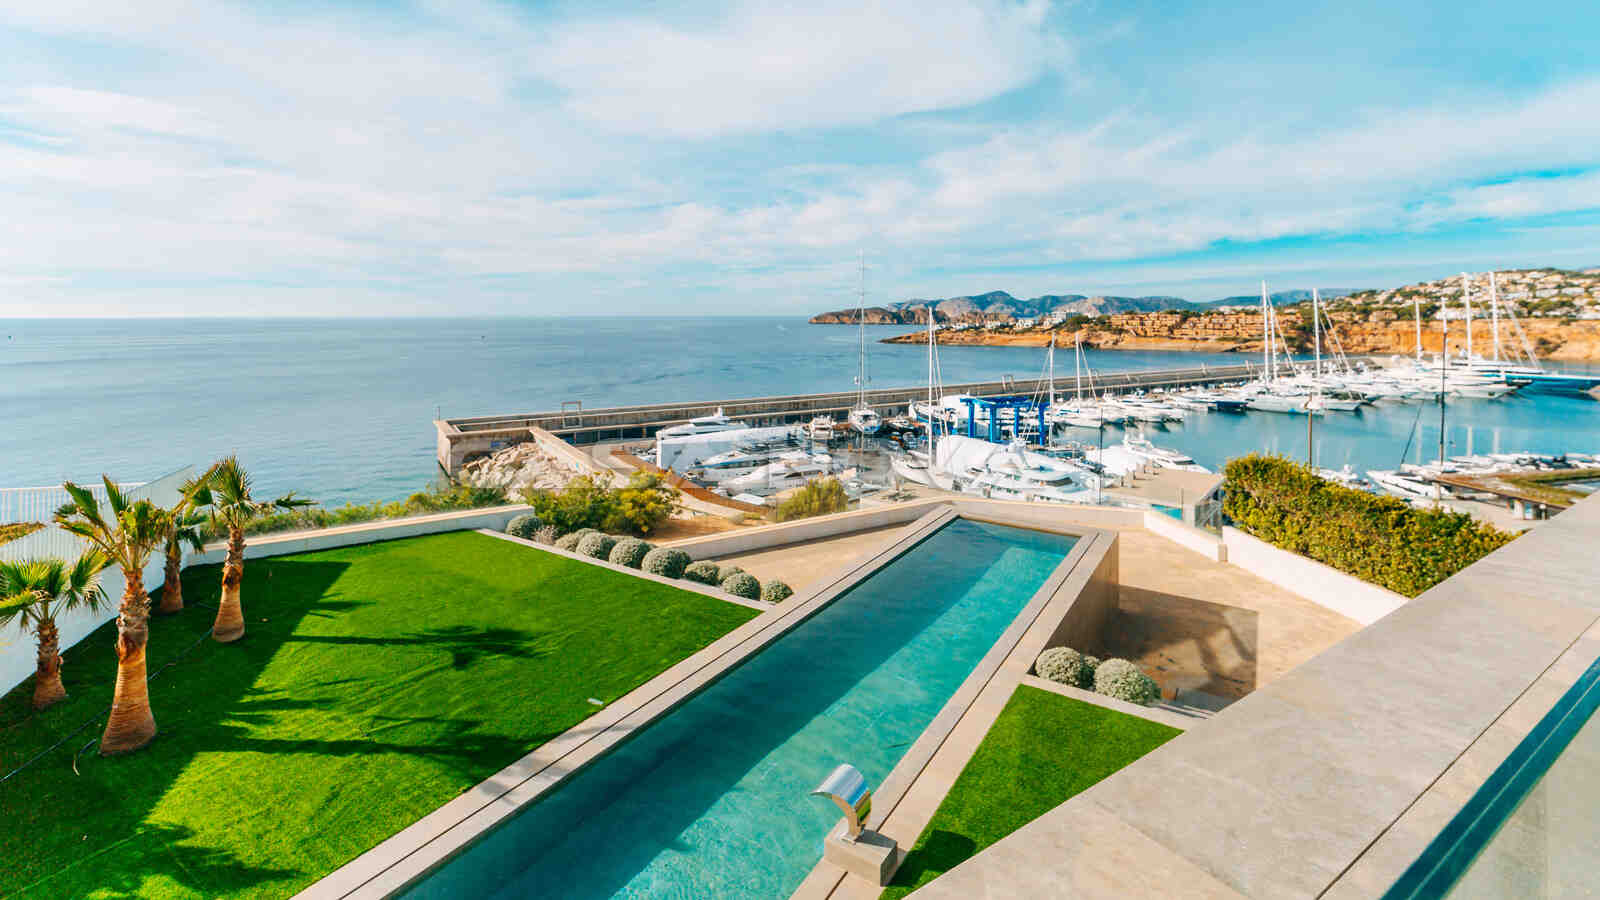 Atemberaubende Villa Mallorca mit traumhaftem Blick